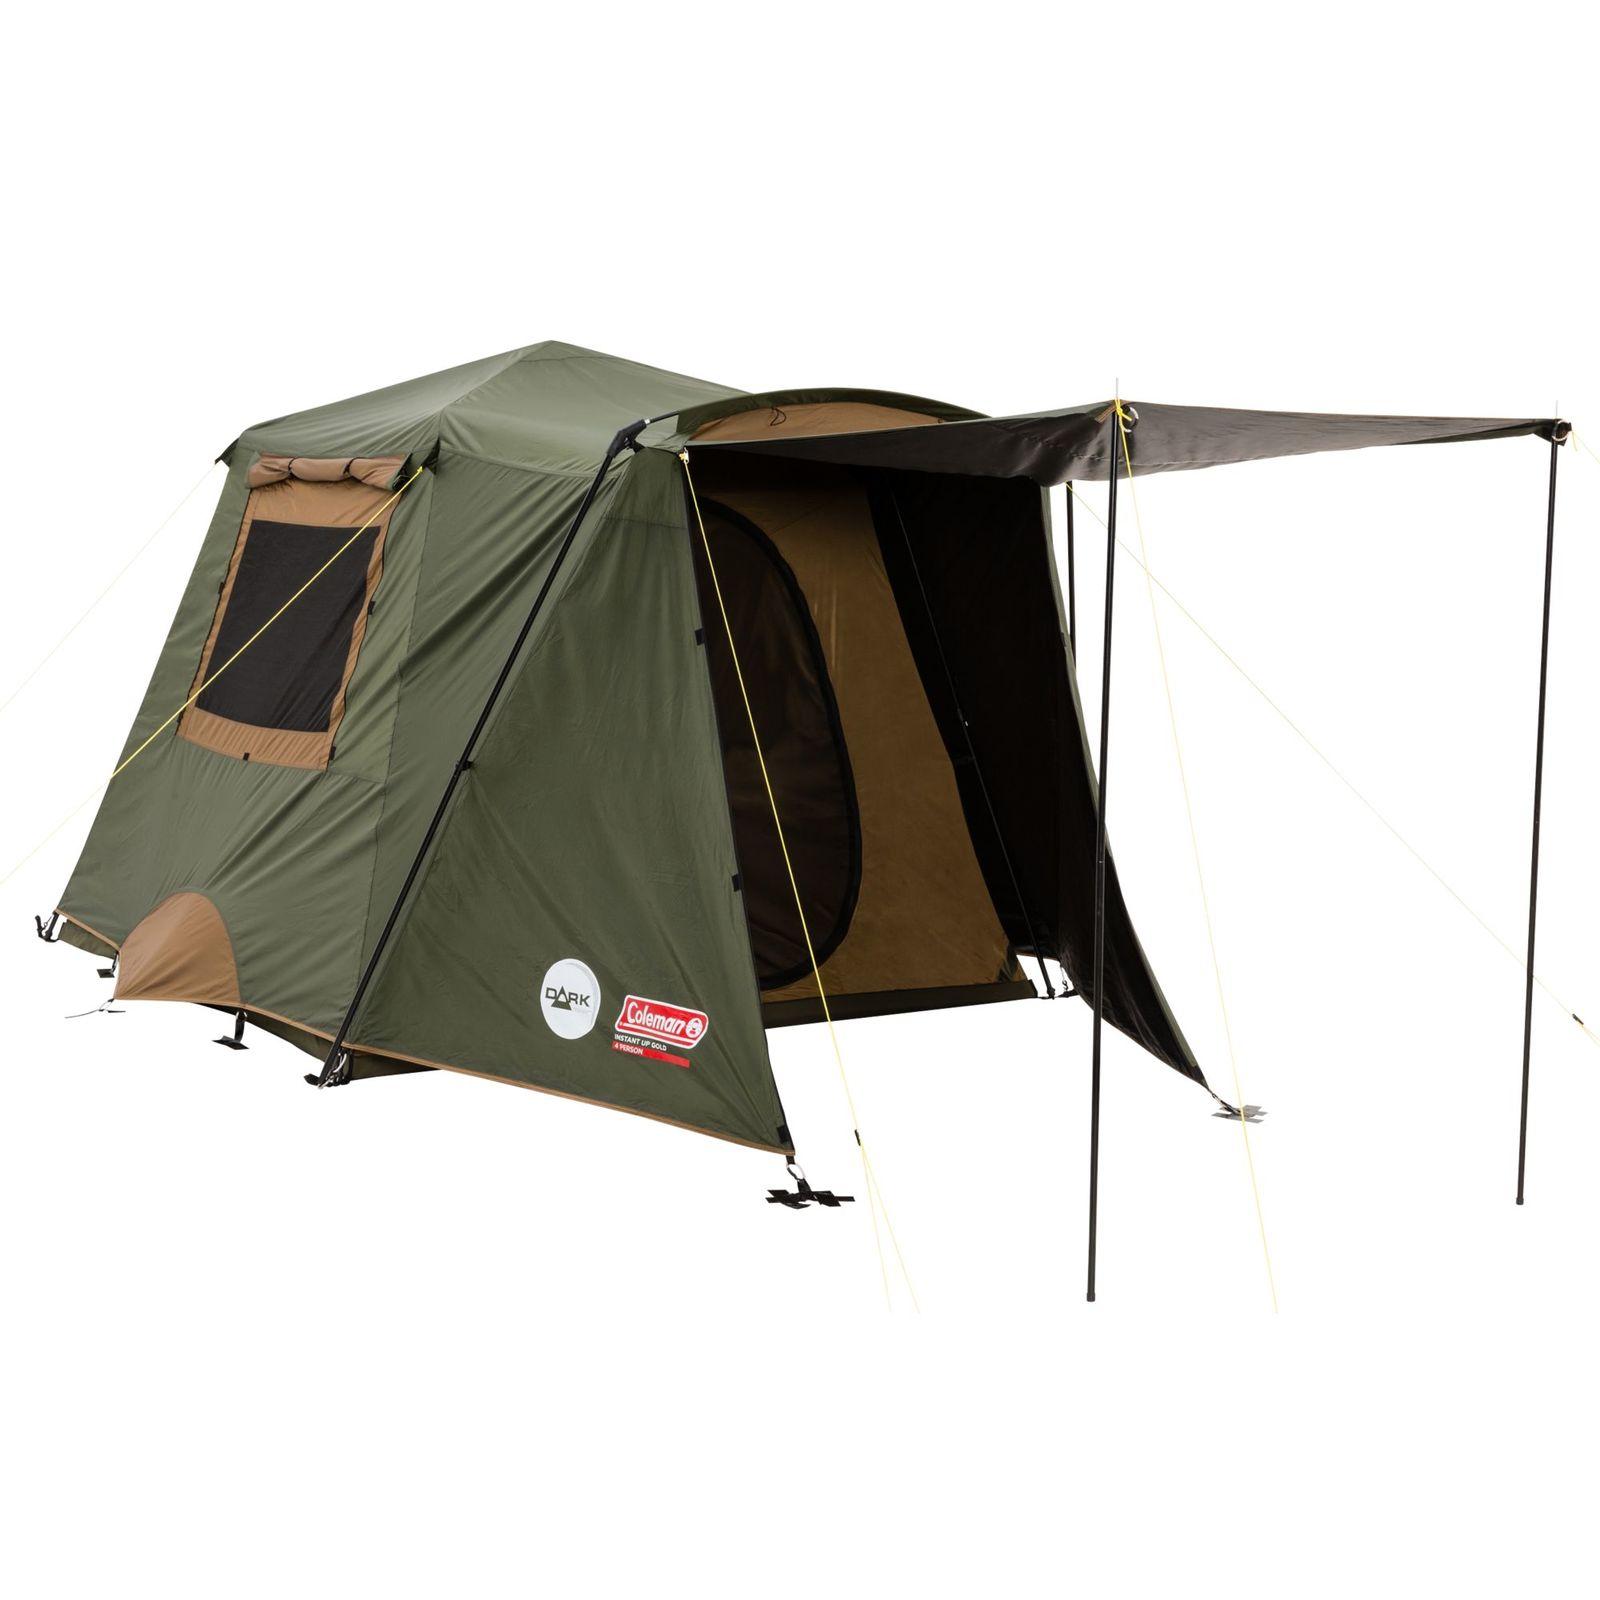 COleman instant tent 4 person 1